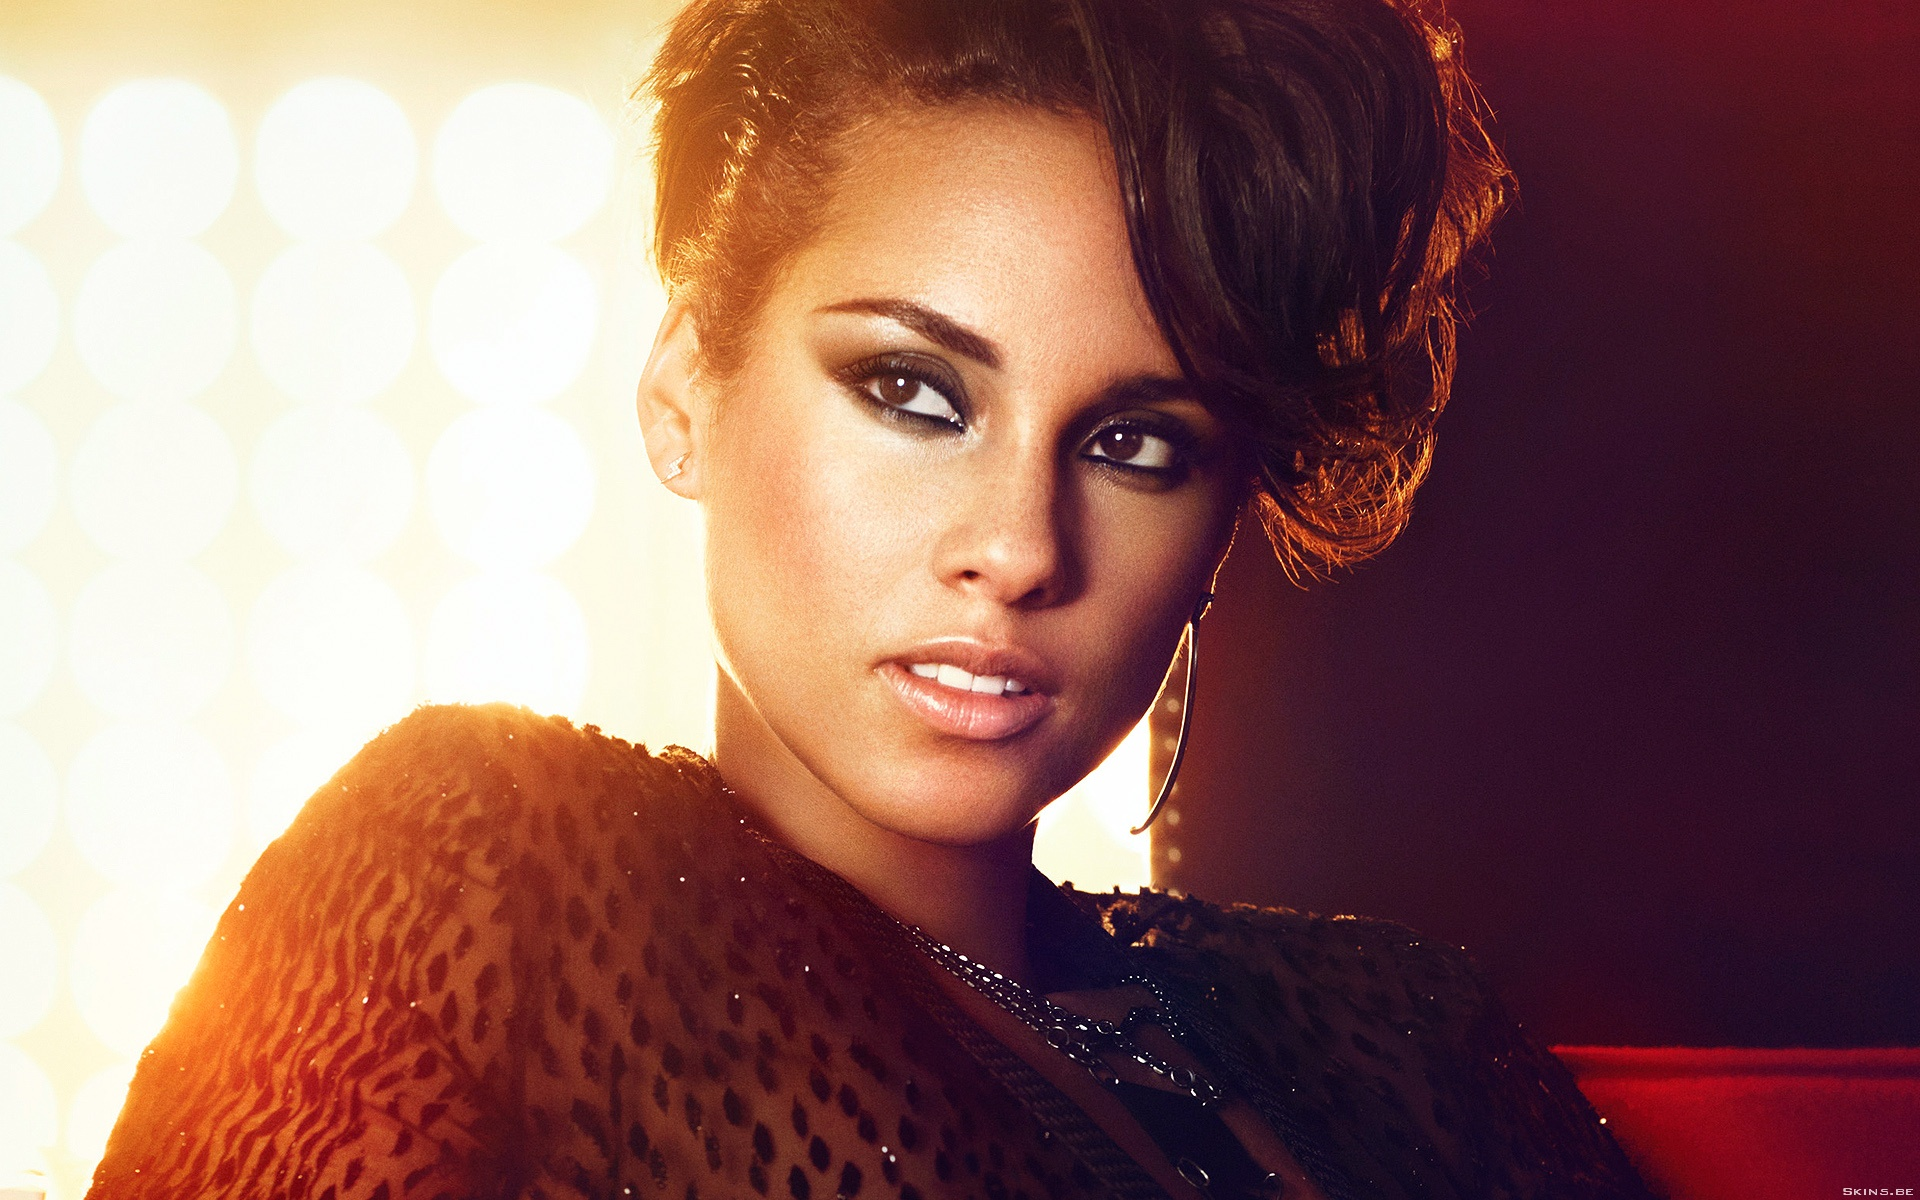 Alicia Keys Widescreen Wallpaper